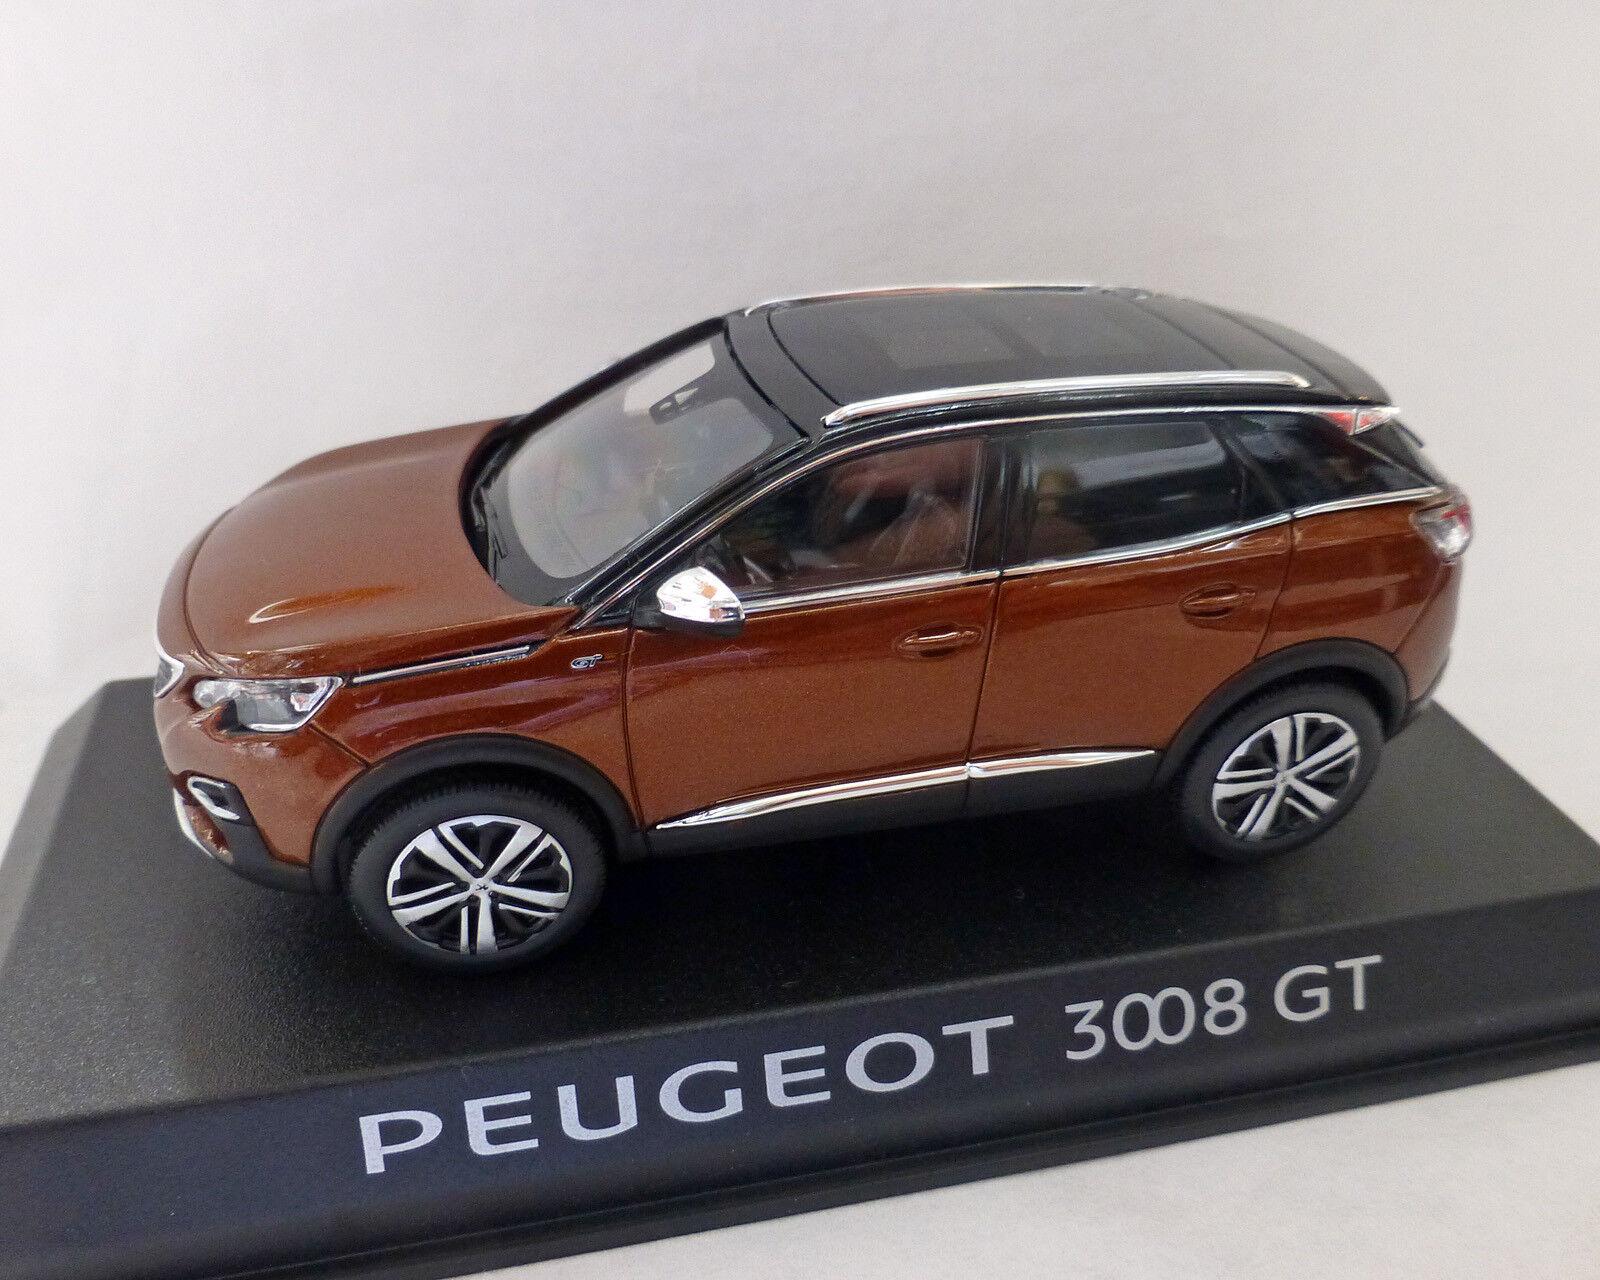 Peugeot 3008 GT 2016, kupfer-Metallic, 1 43 NOREV  | Angemessener Preis